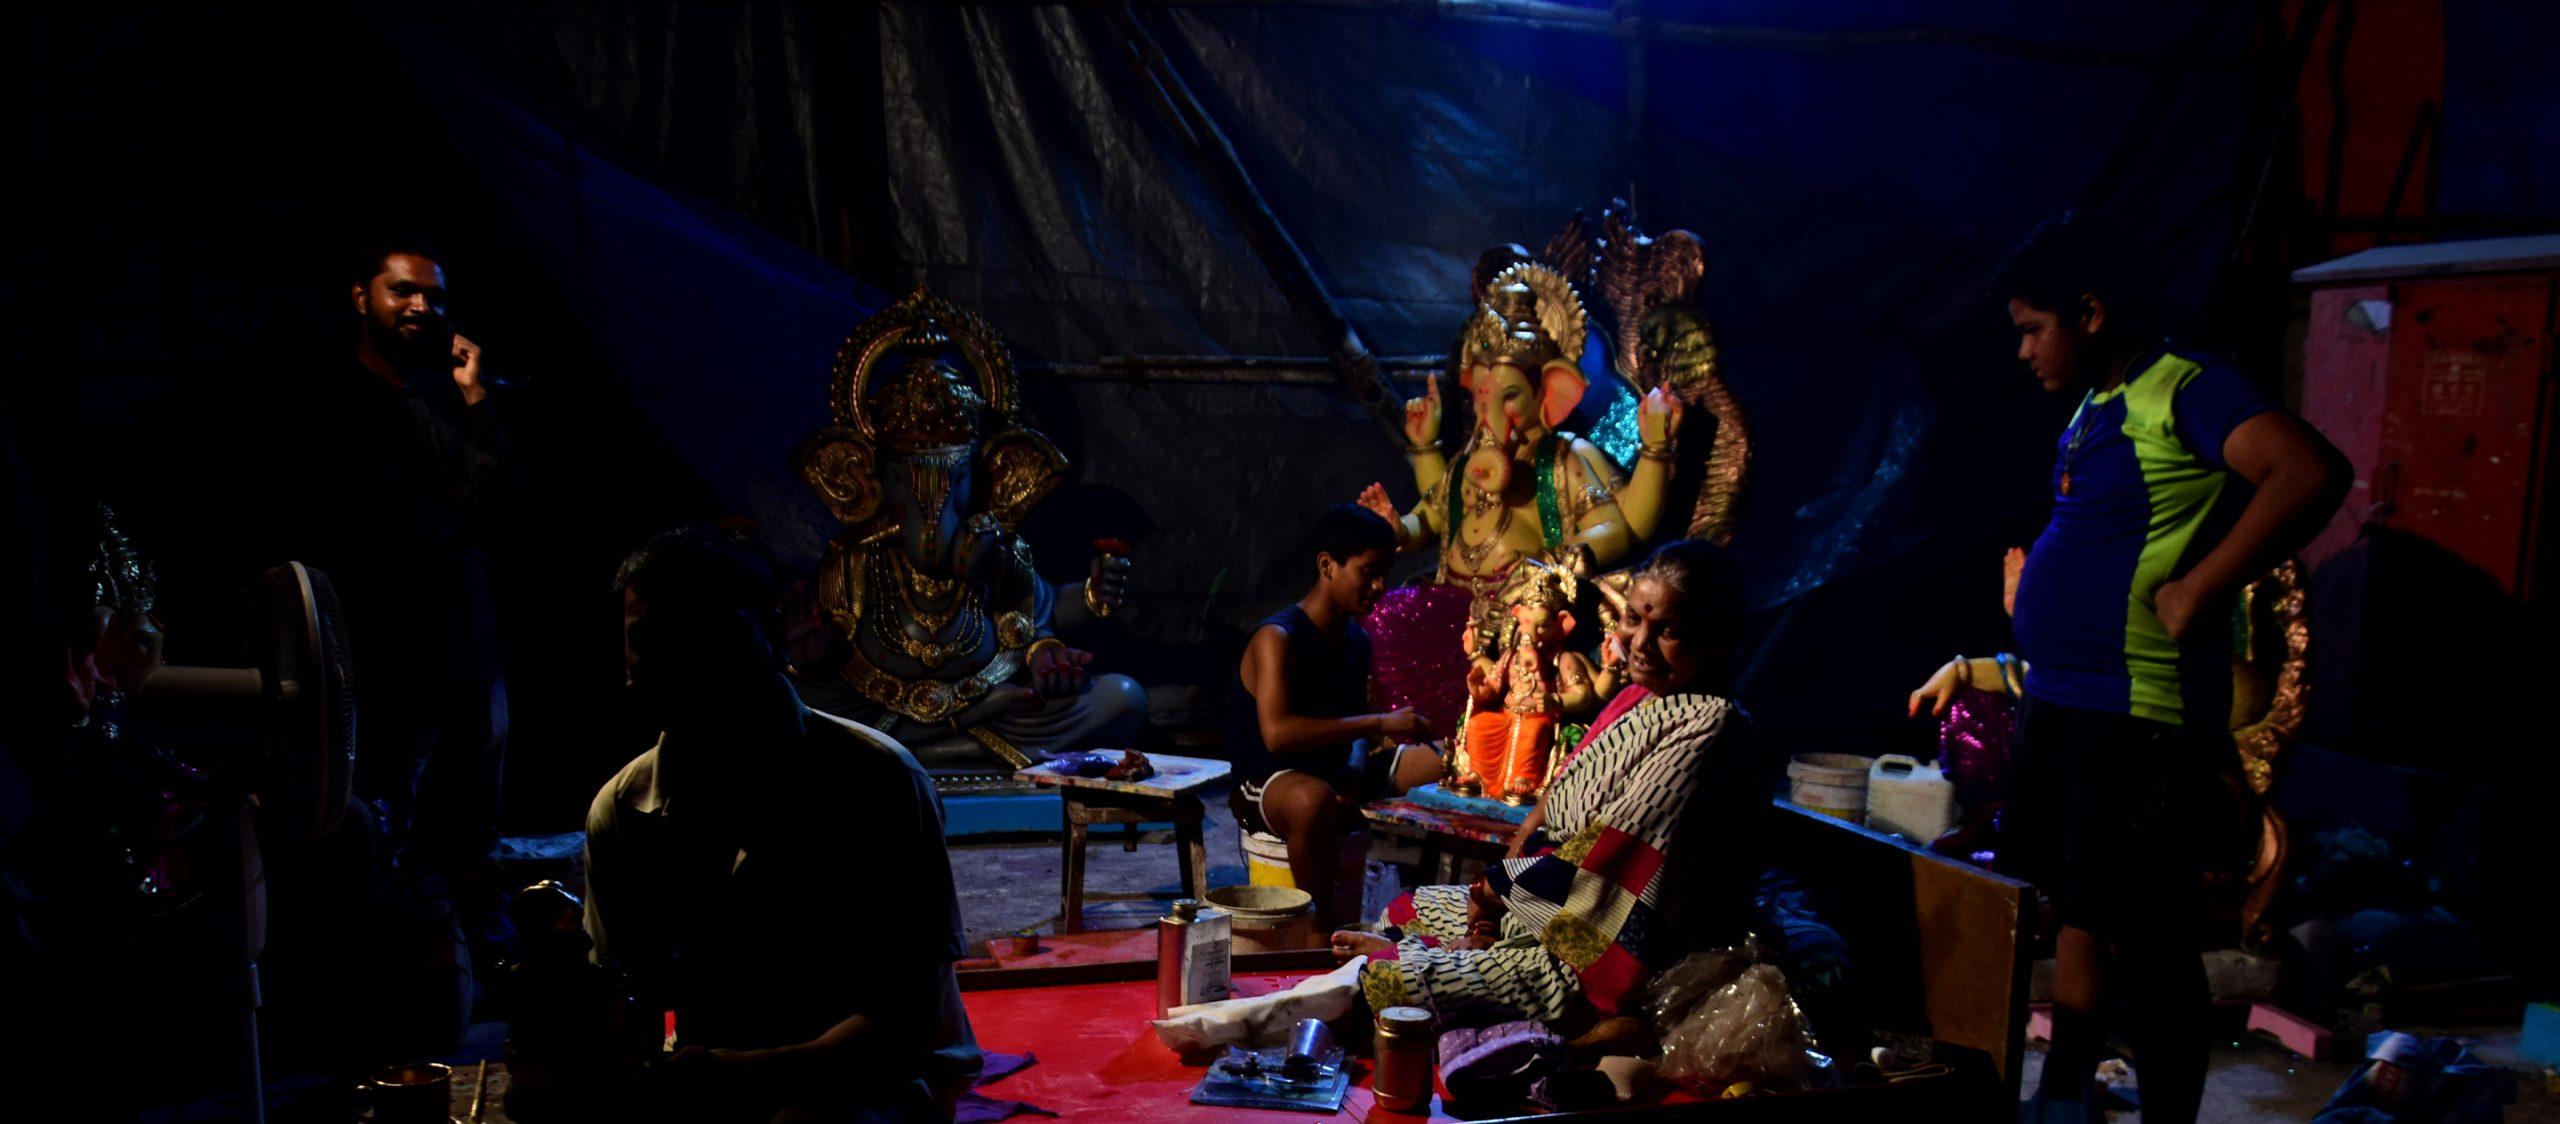 Do you hear the Ganesh sing? คเณศจตุรถีกับเสียงสะท้อนด้านสิ่งแวดล้อมและการเมือง